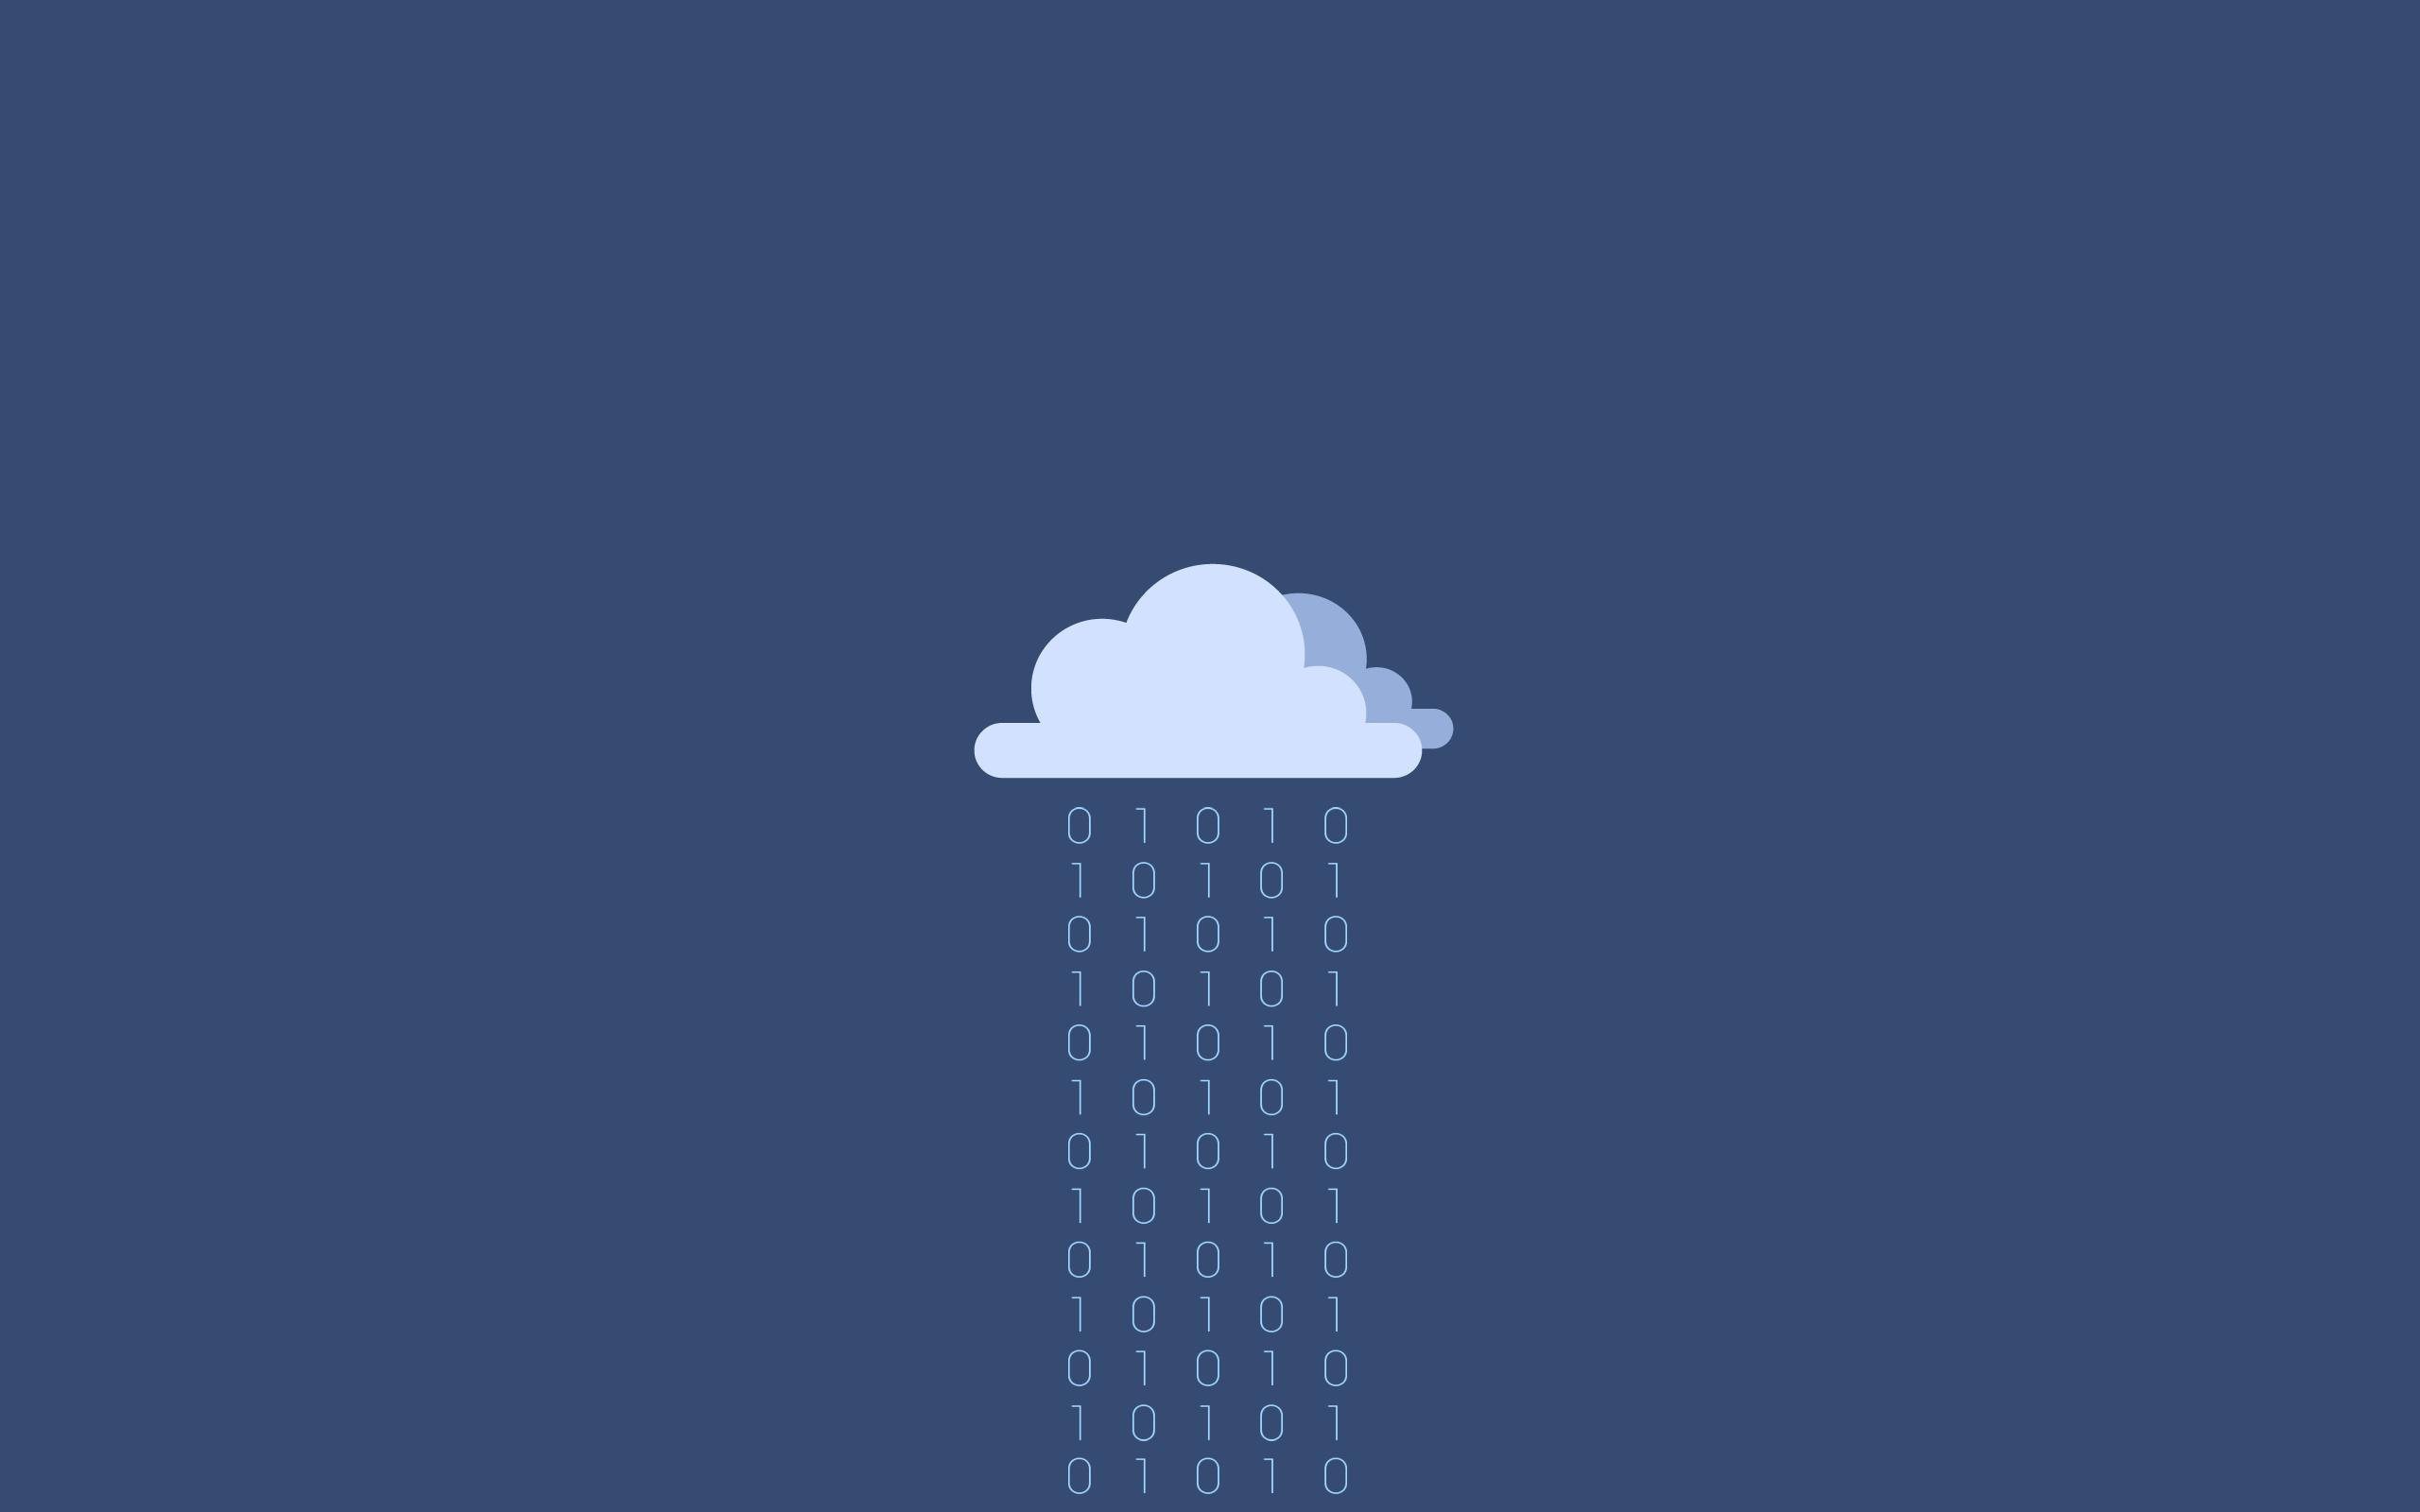 37 Programmer Code Wallpaper Backgrounds Download 2560x1600